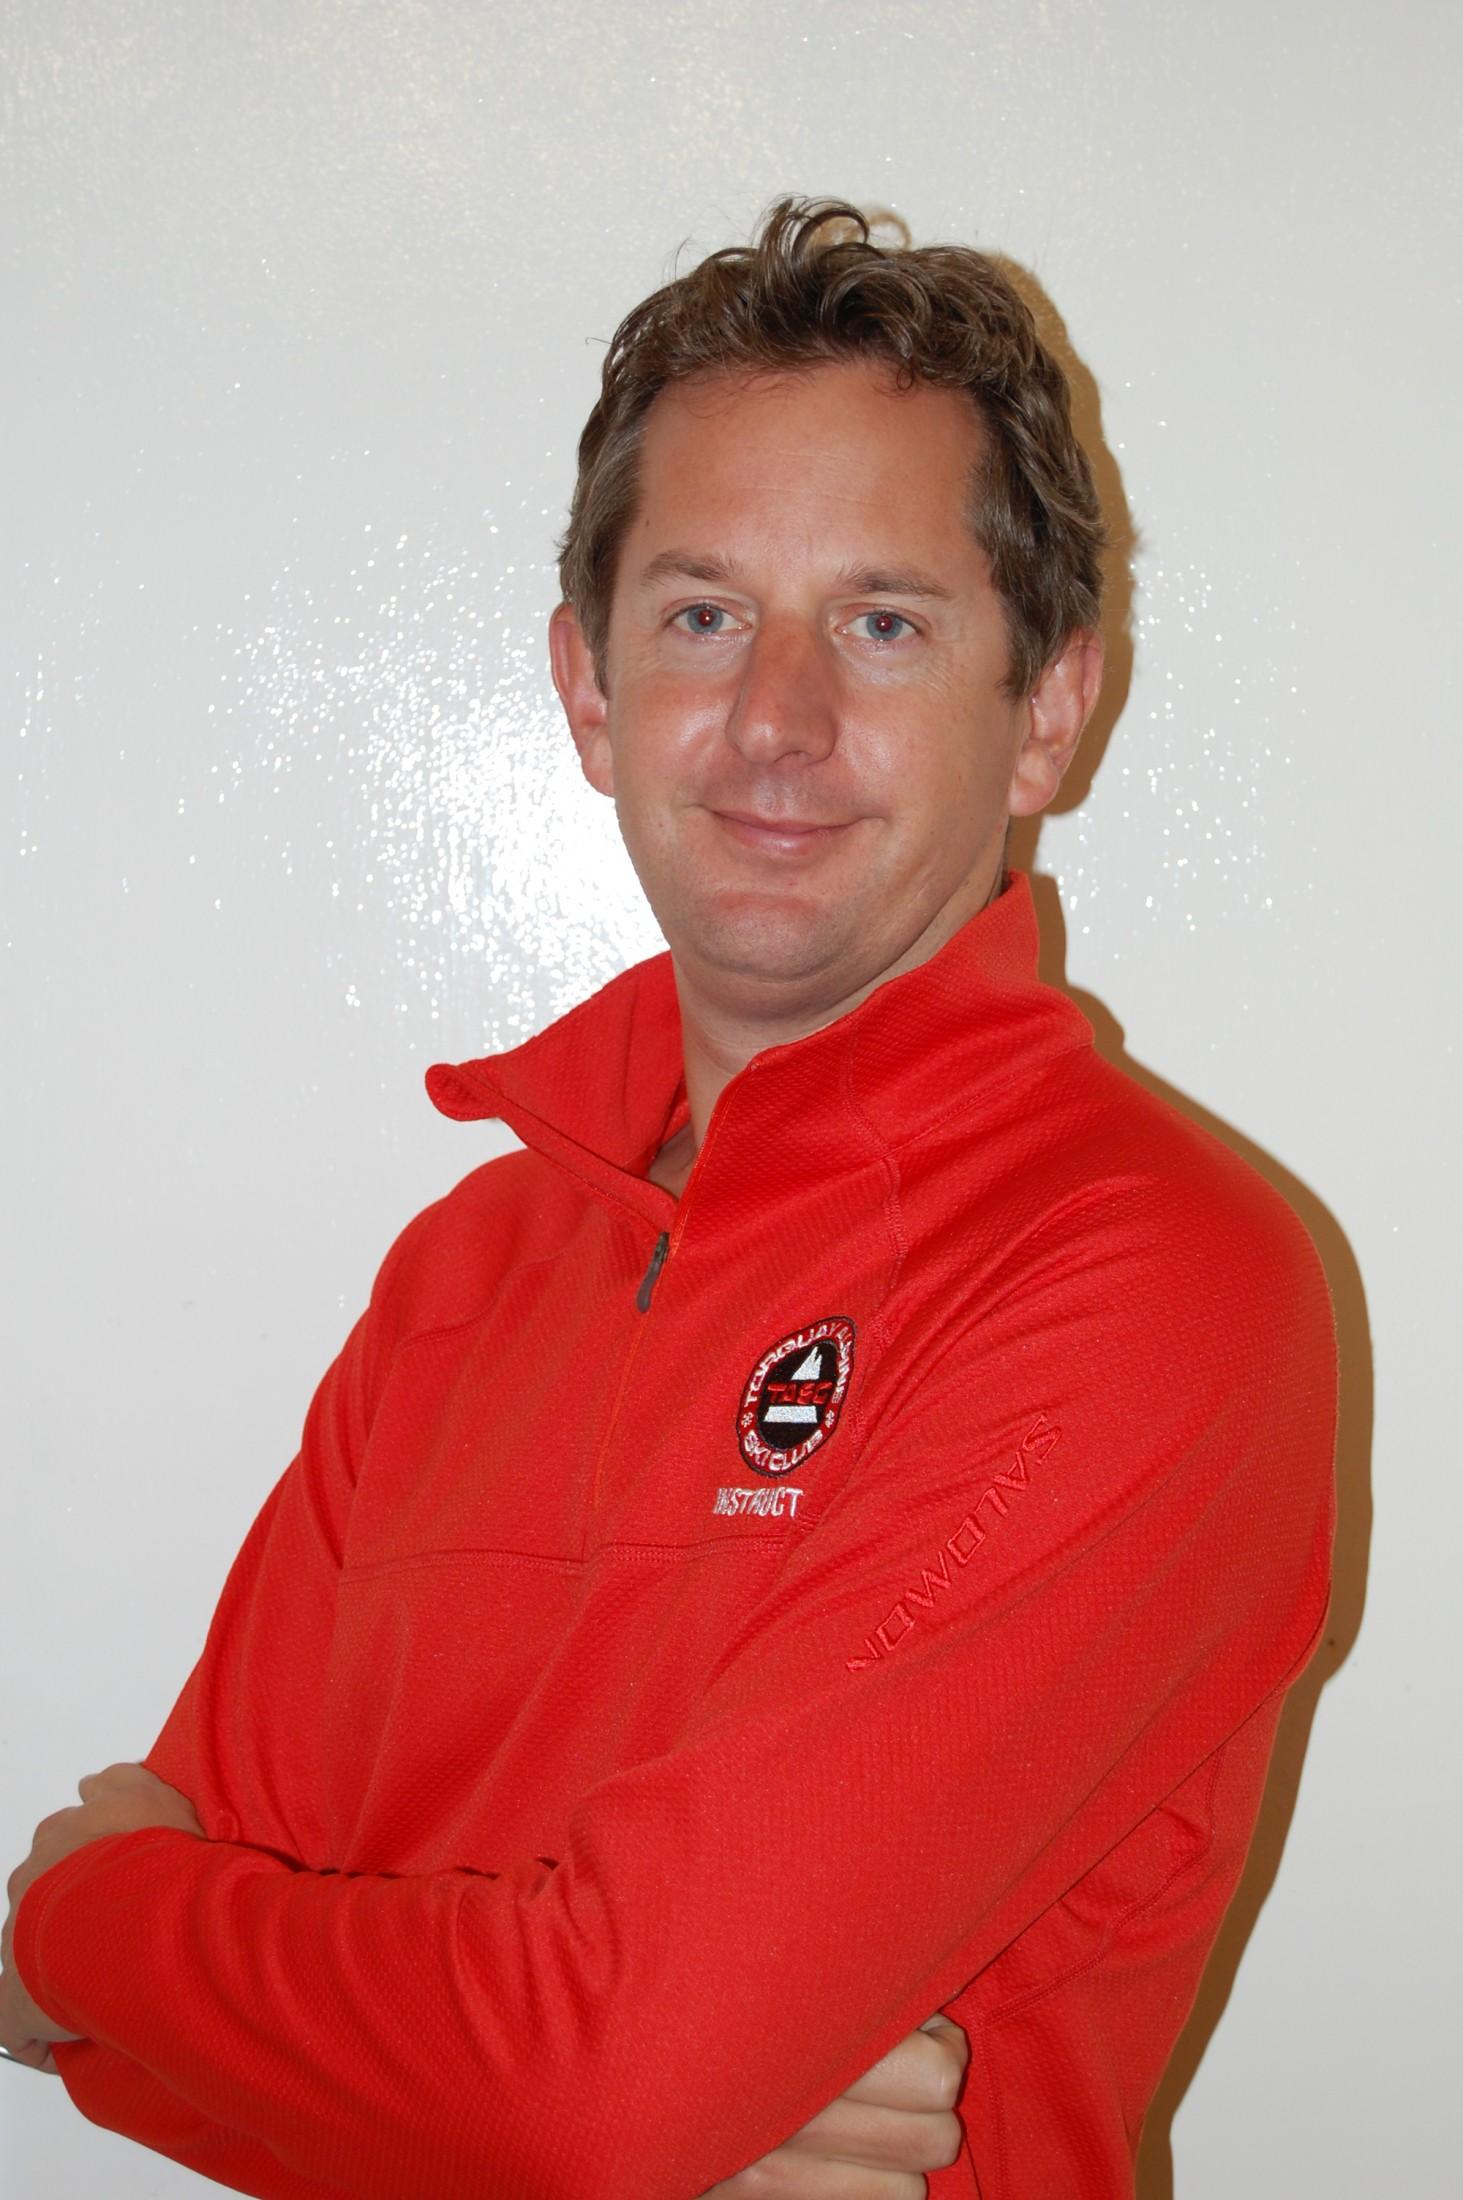 Neil Lomas